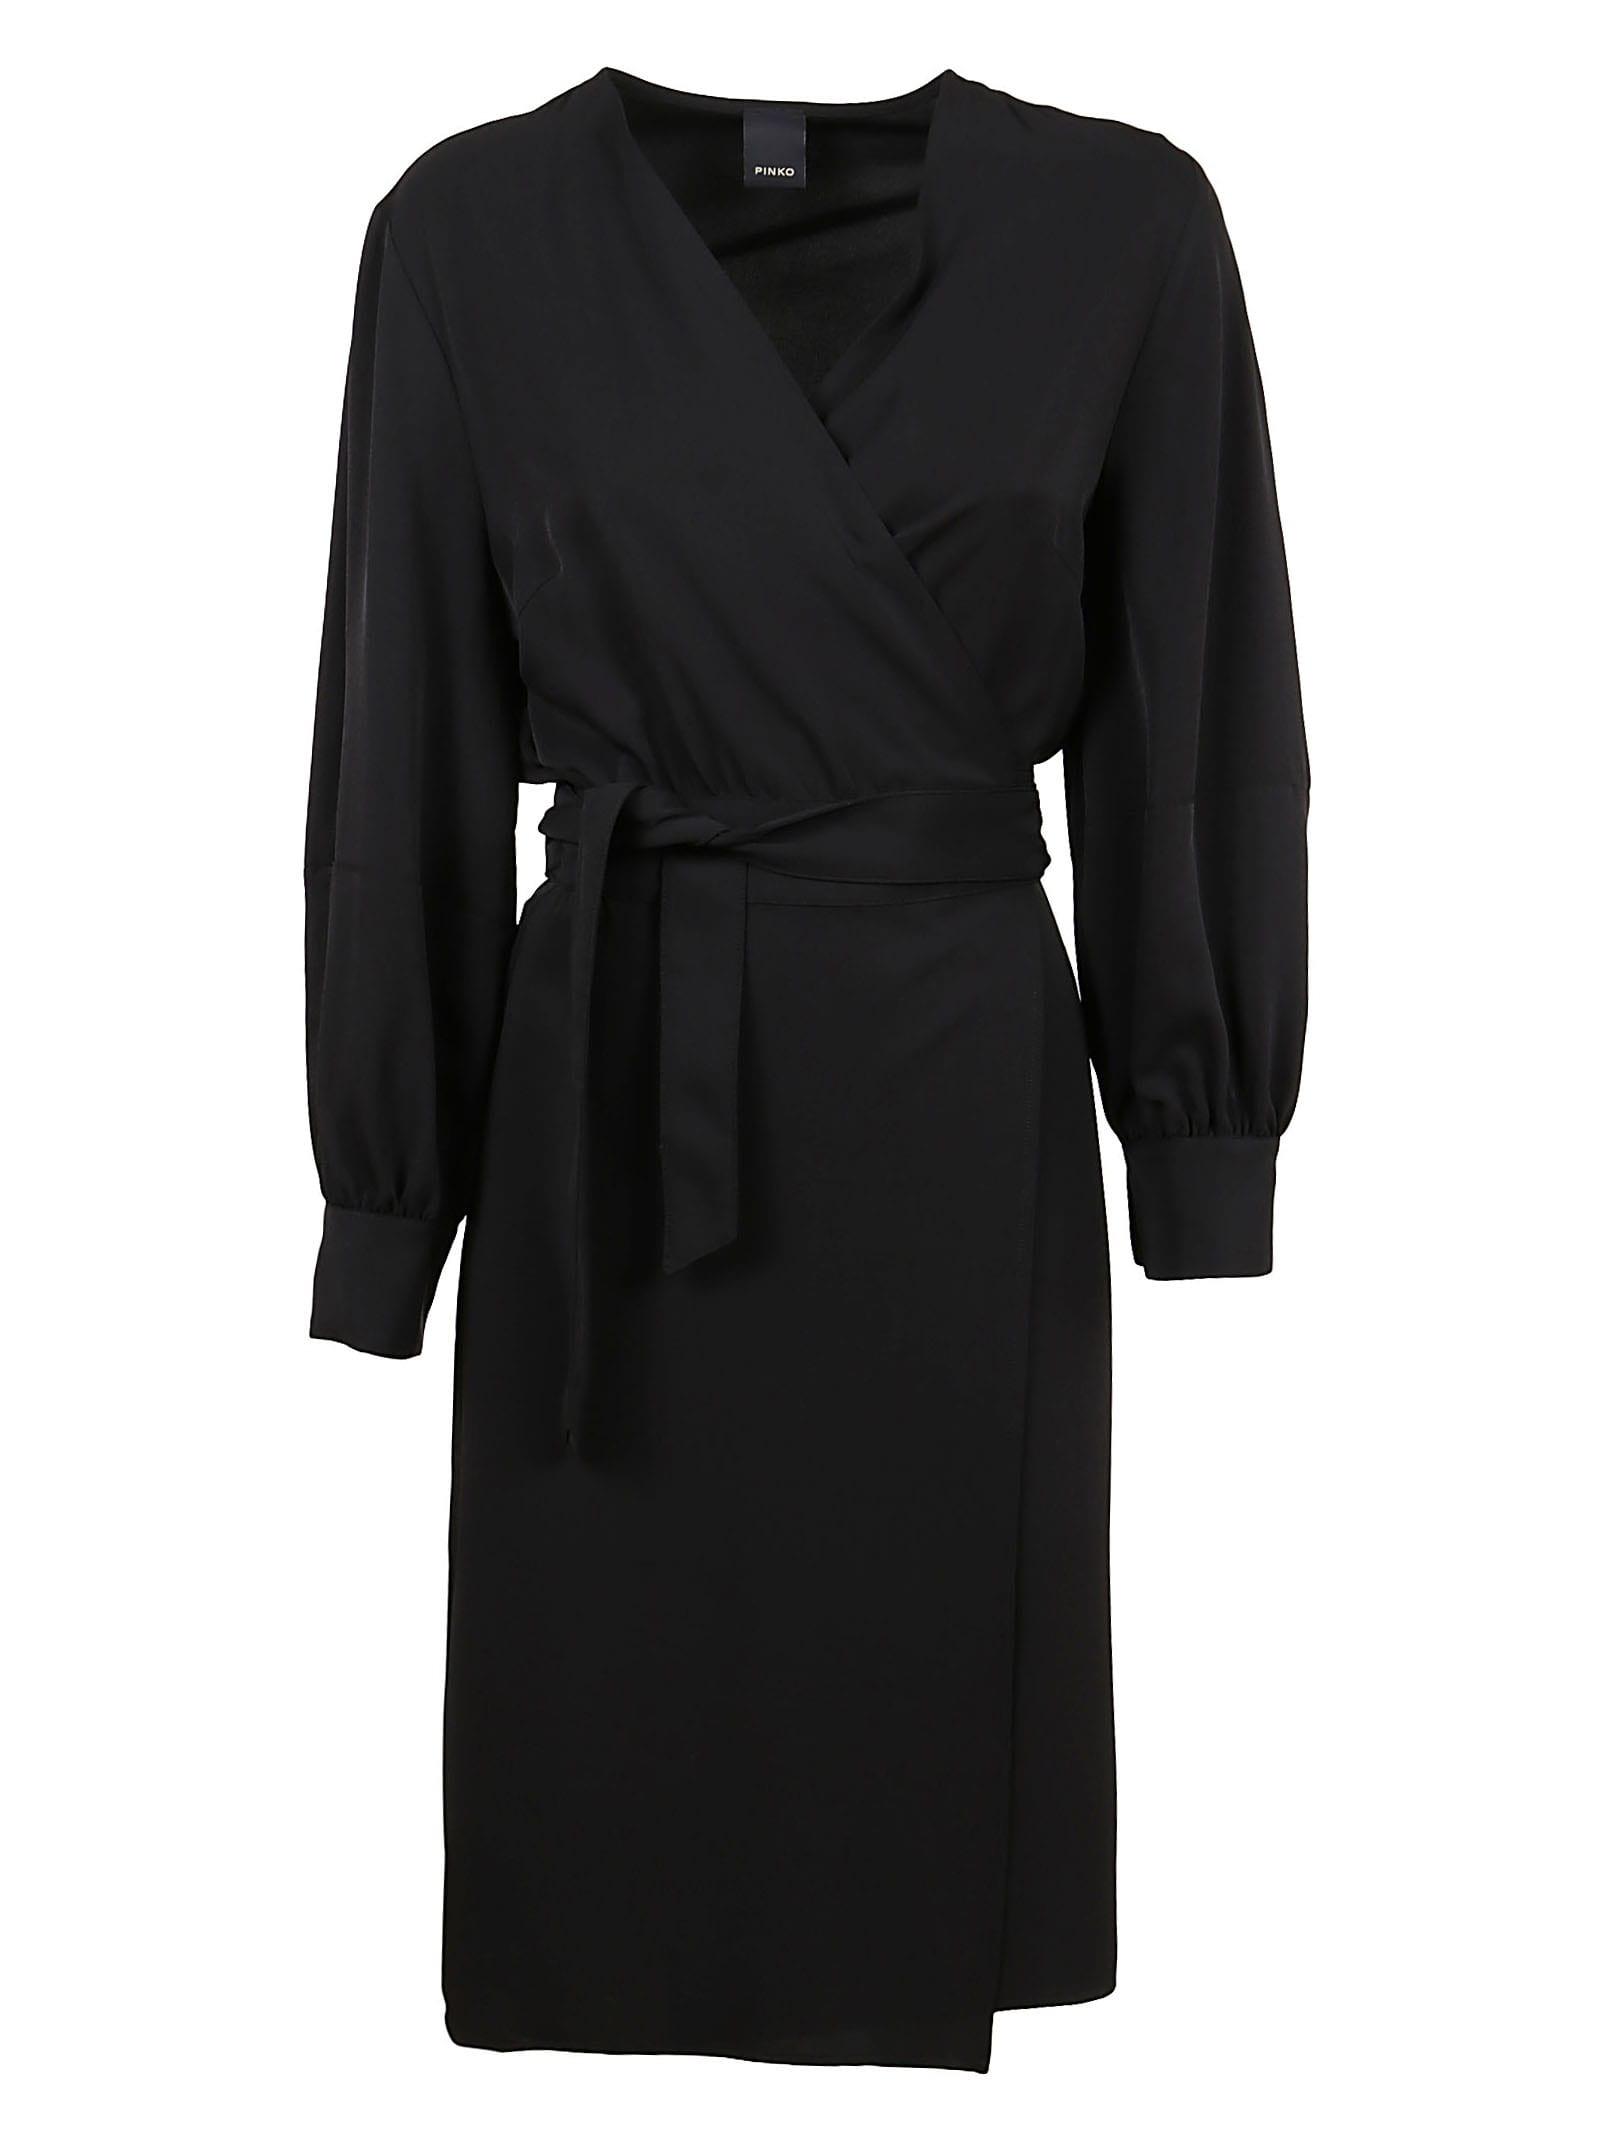 Buy Pinko Black Fluid Fabric Dress online, shop Pinko with free shipping